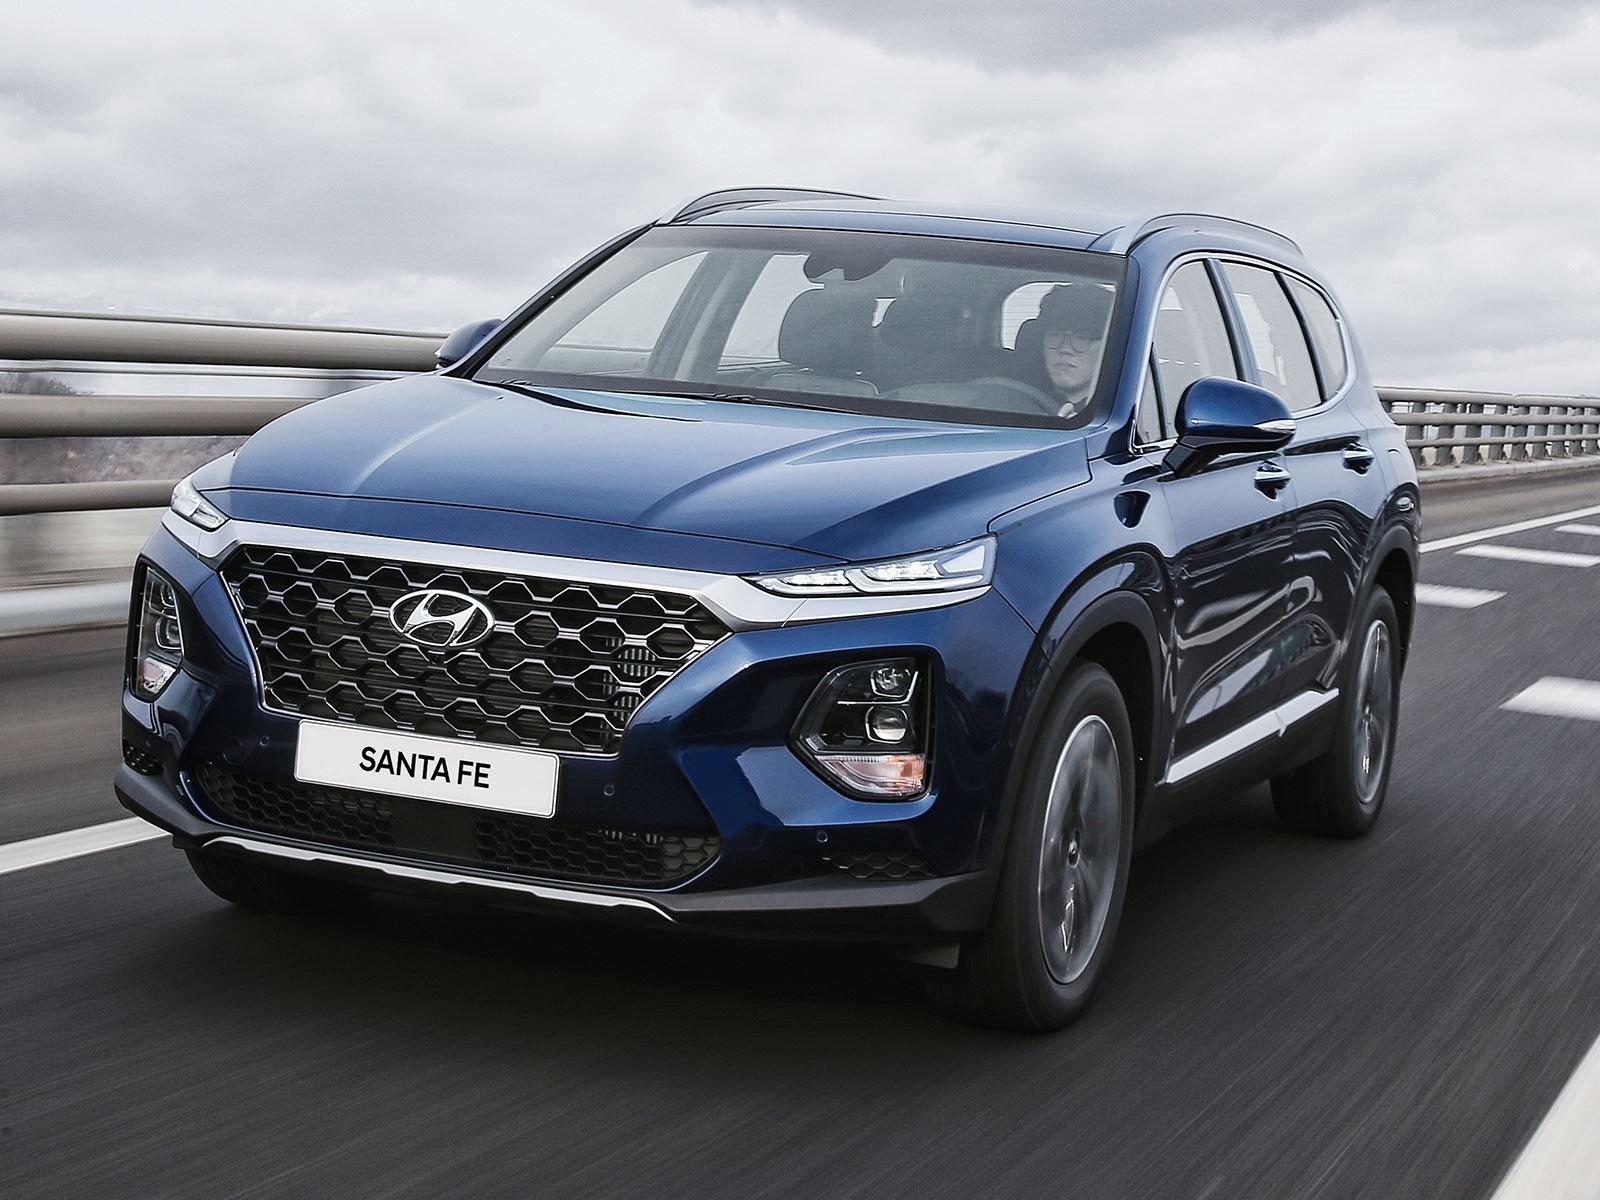 2019 Hyundai Santa Fe New Spy Shots And Redesign News >> All New 2019 Hyundai Santa Fe Revealed With A Bold New Look